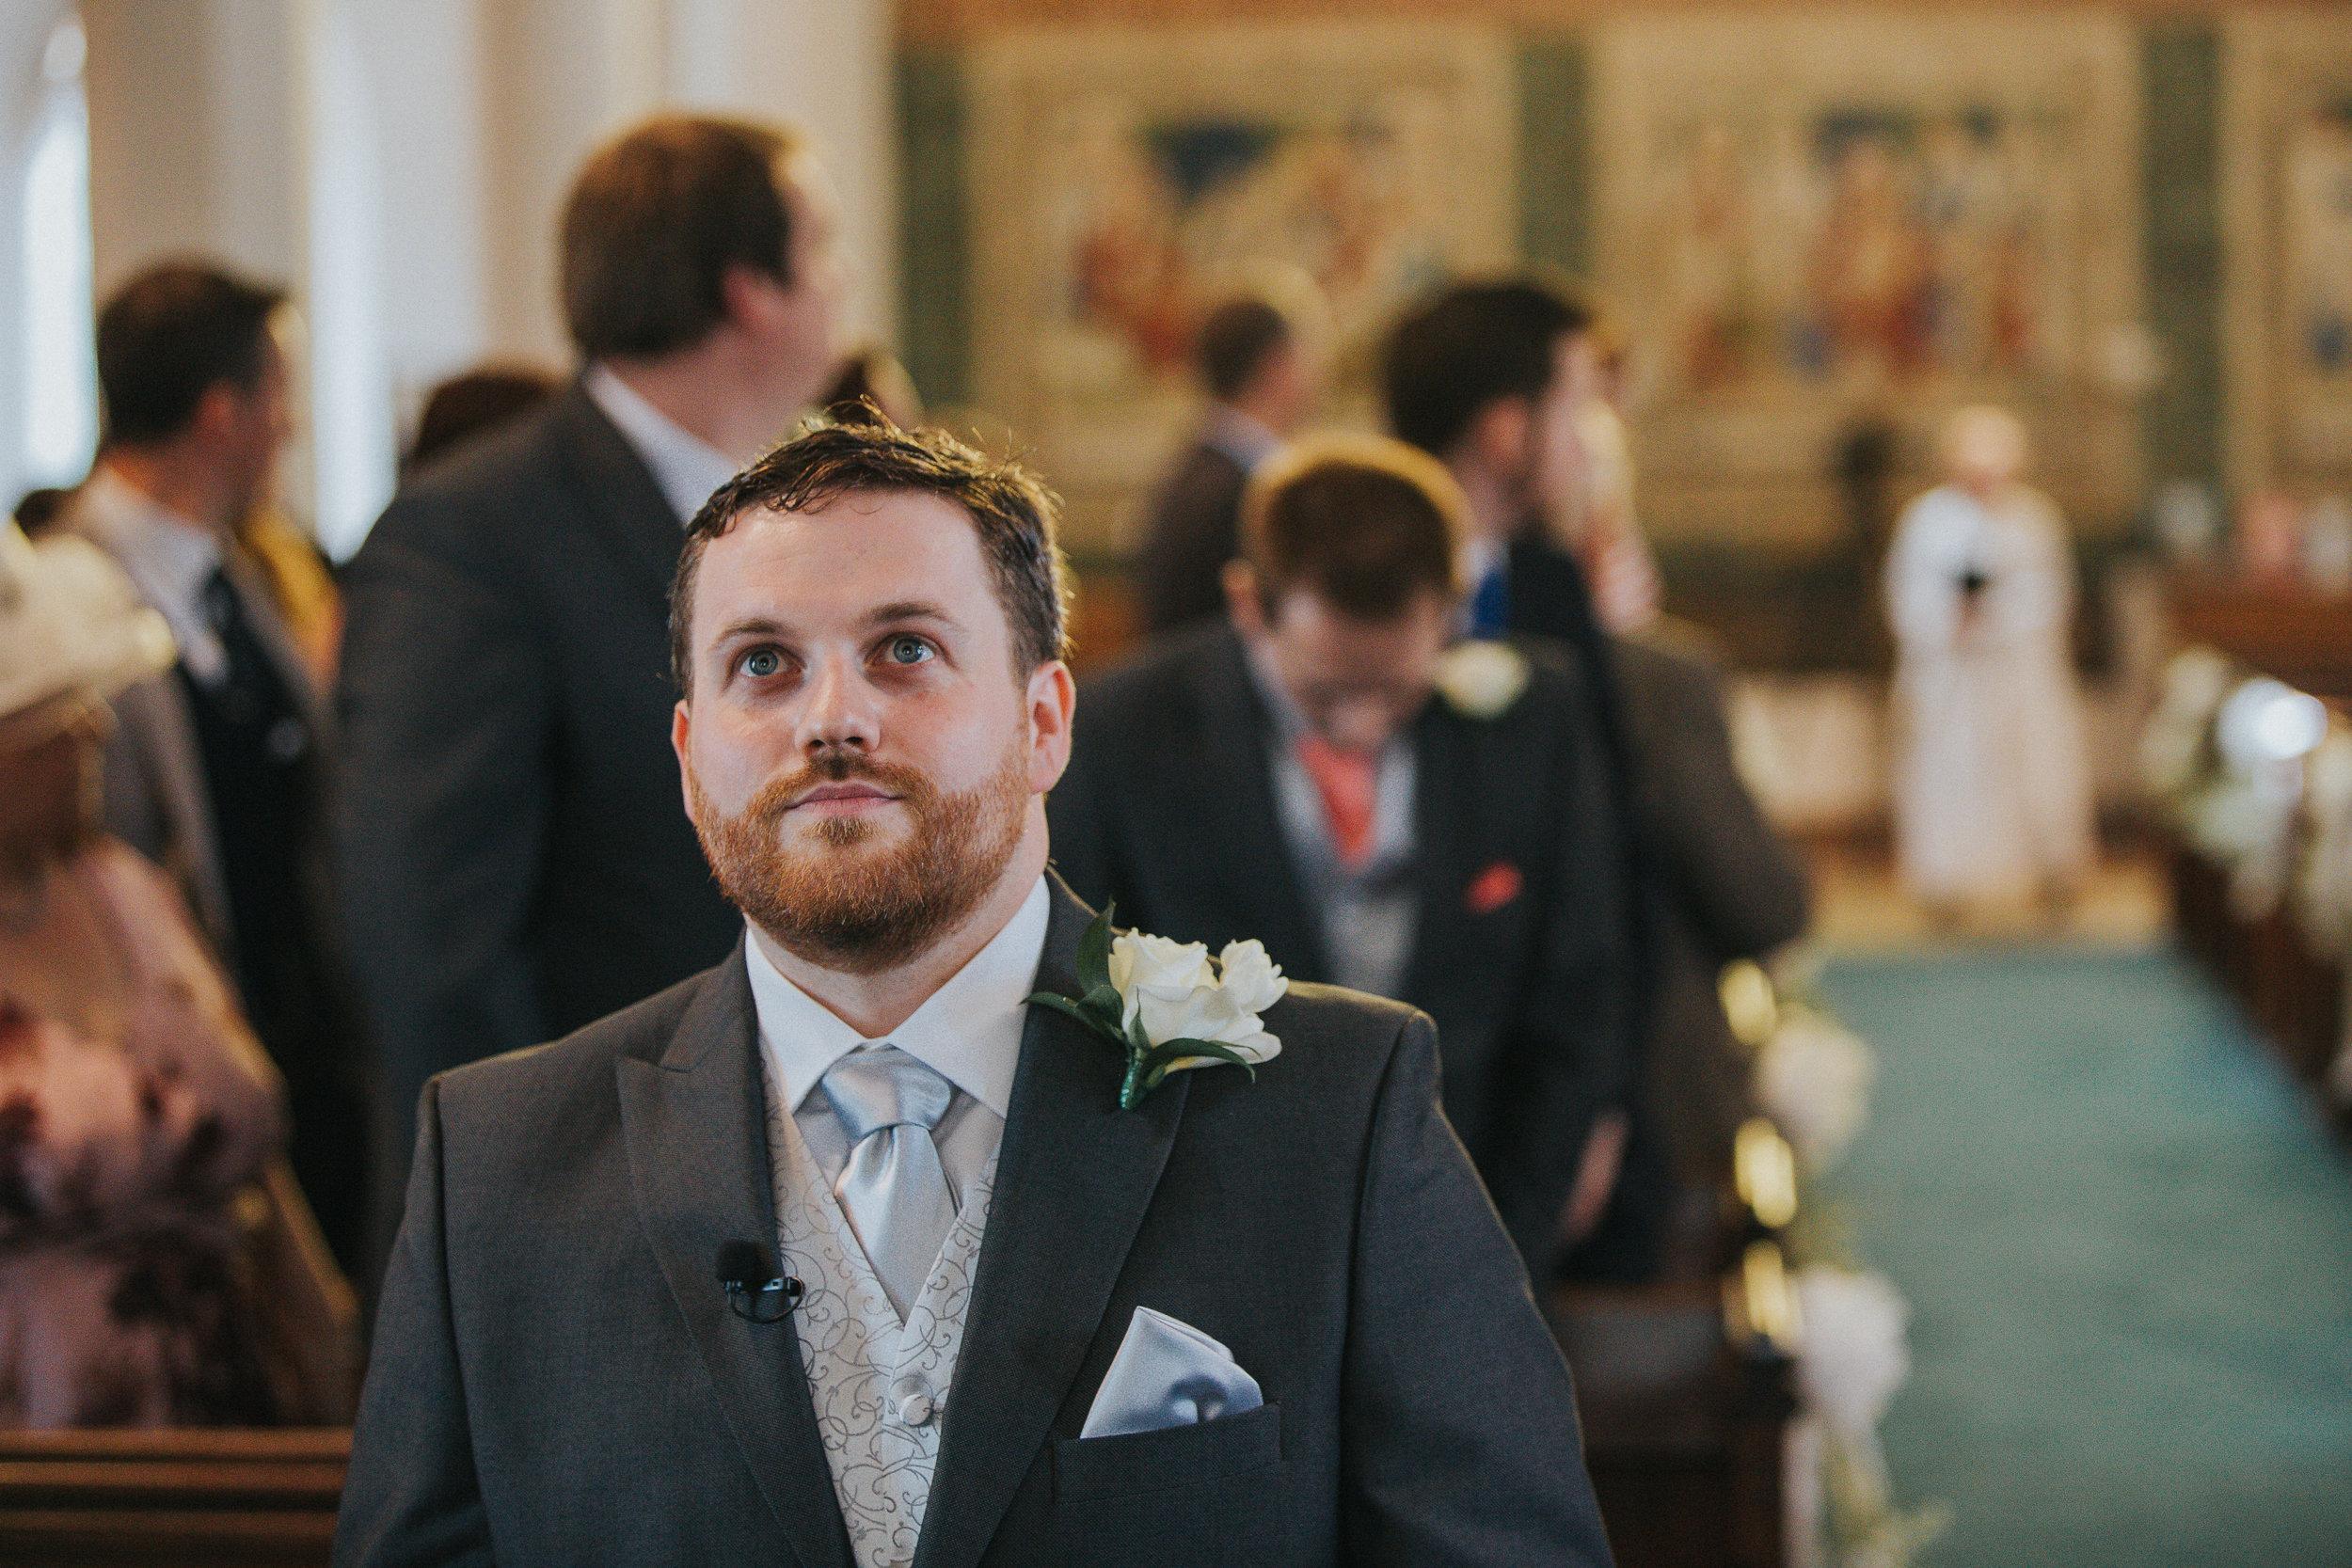 reigate-surrey-london-wedding-photography-nervous-groom-30